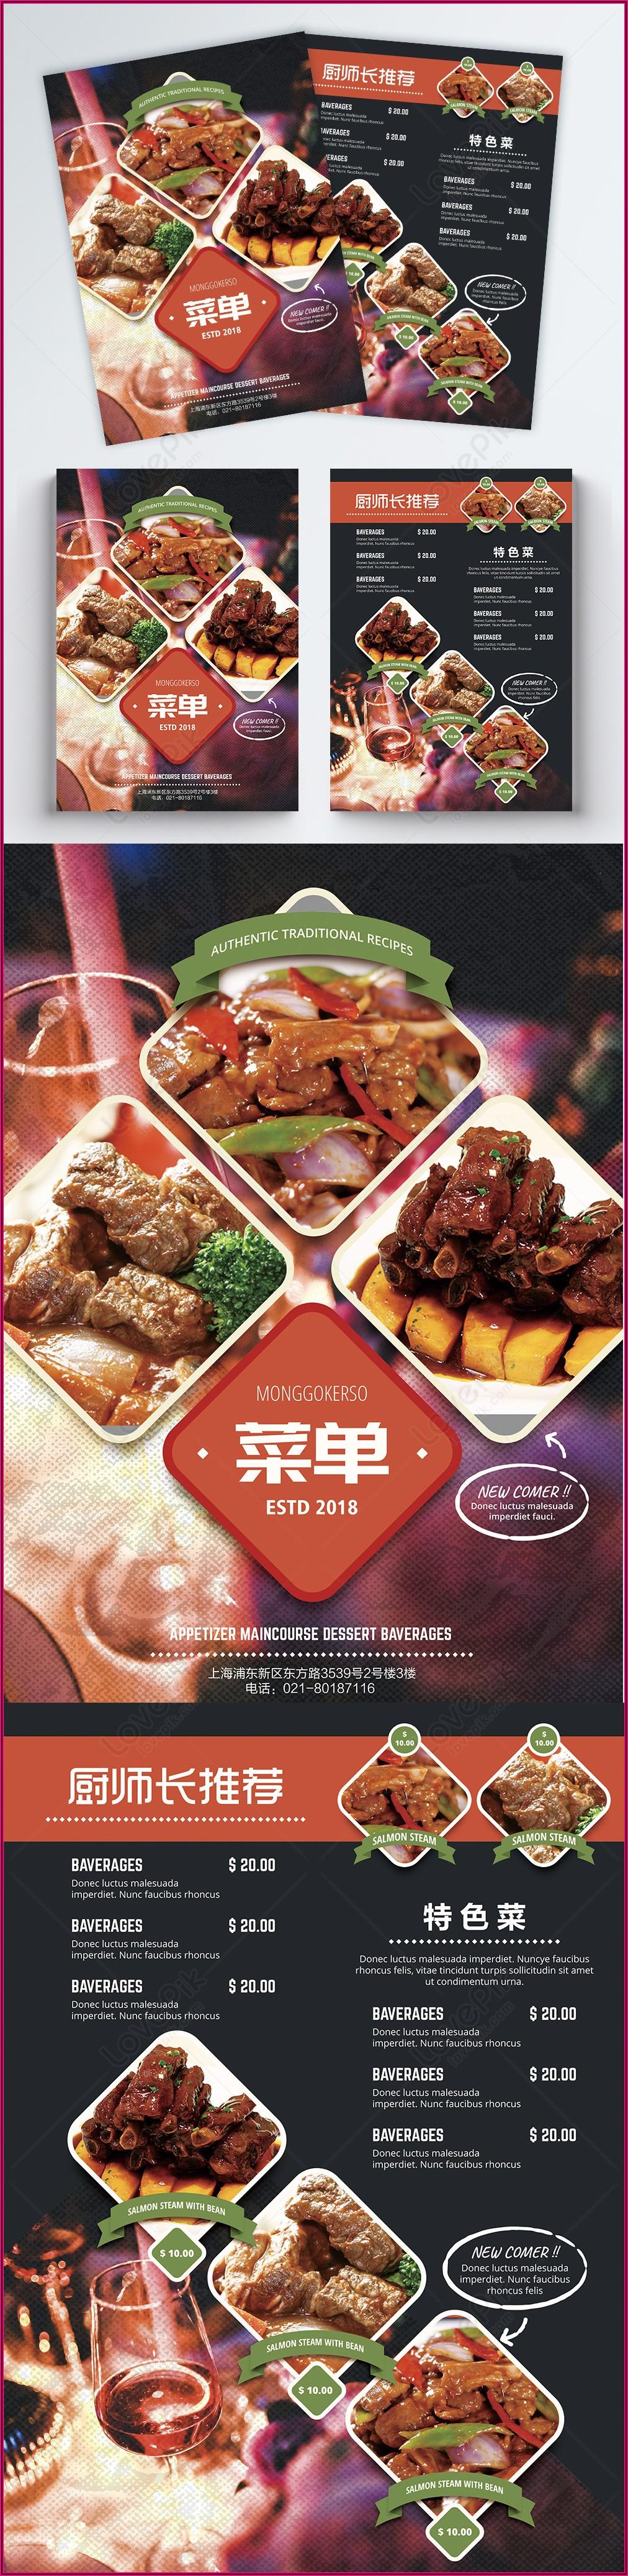 Chinese Menu Template Free